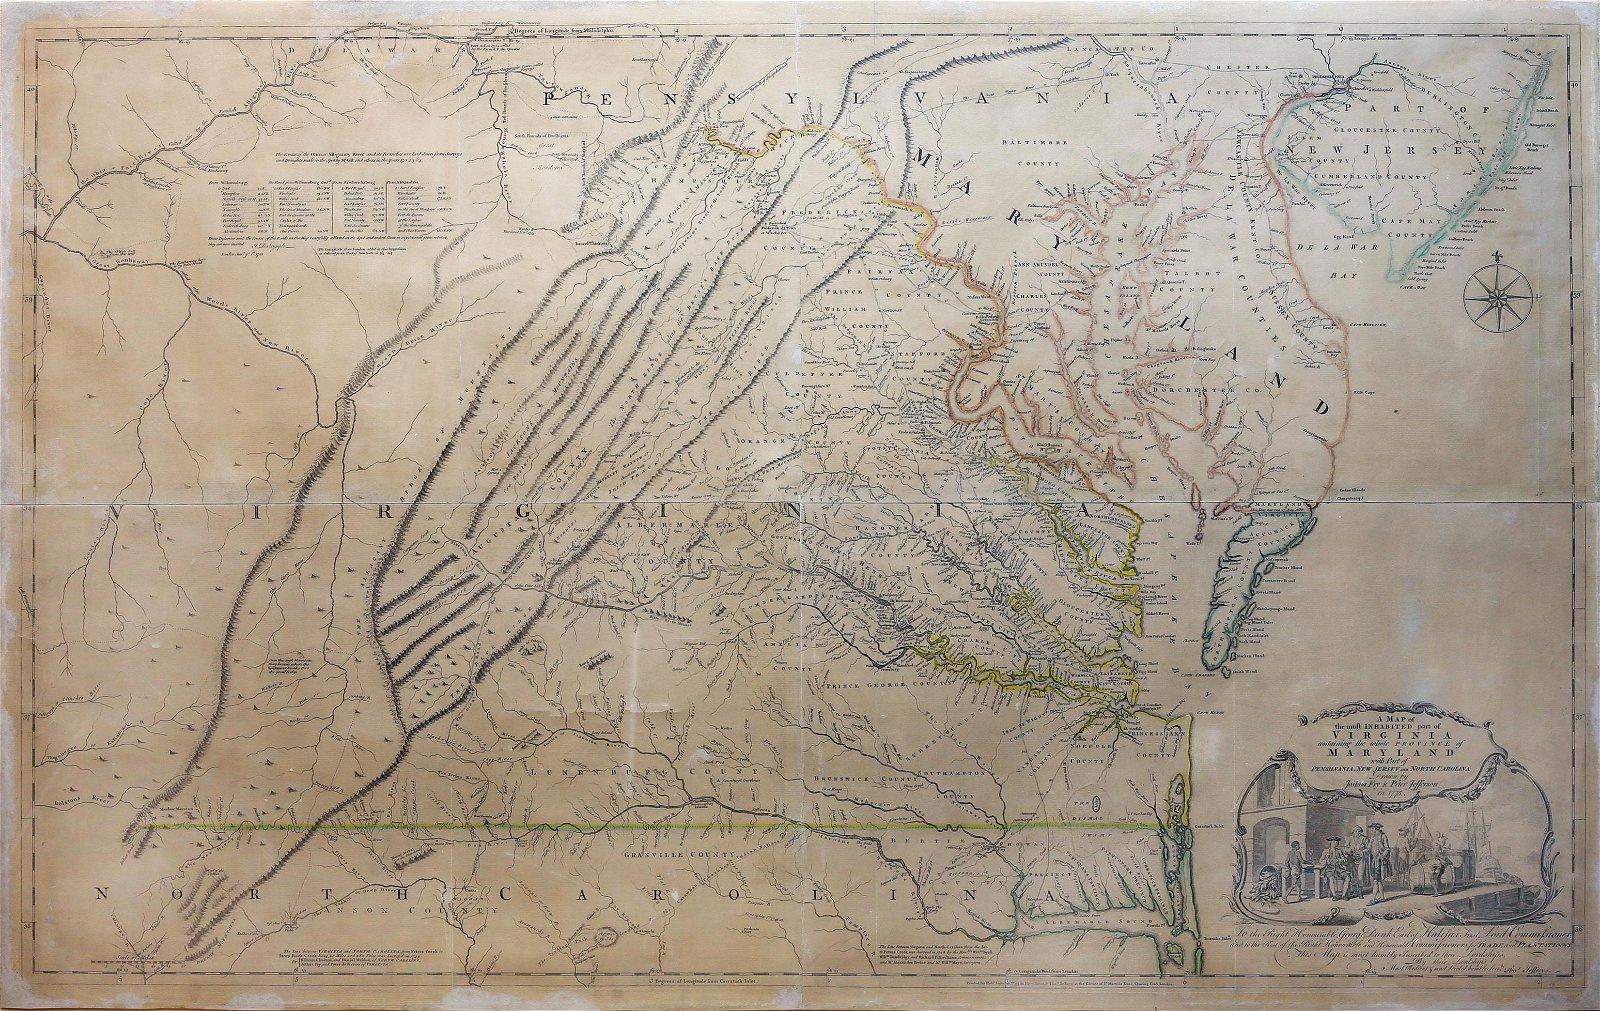 Fry & Jefferson Map of Virginia, 1775